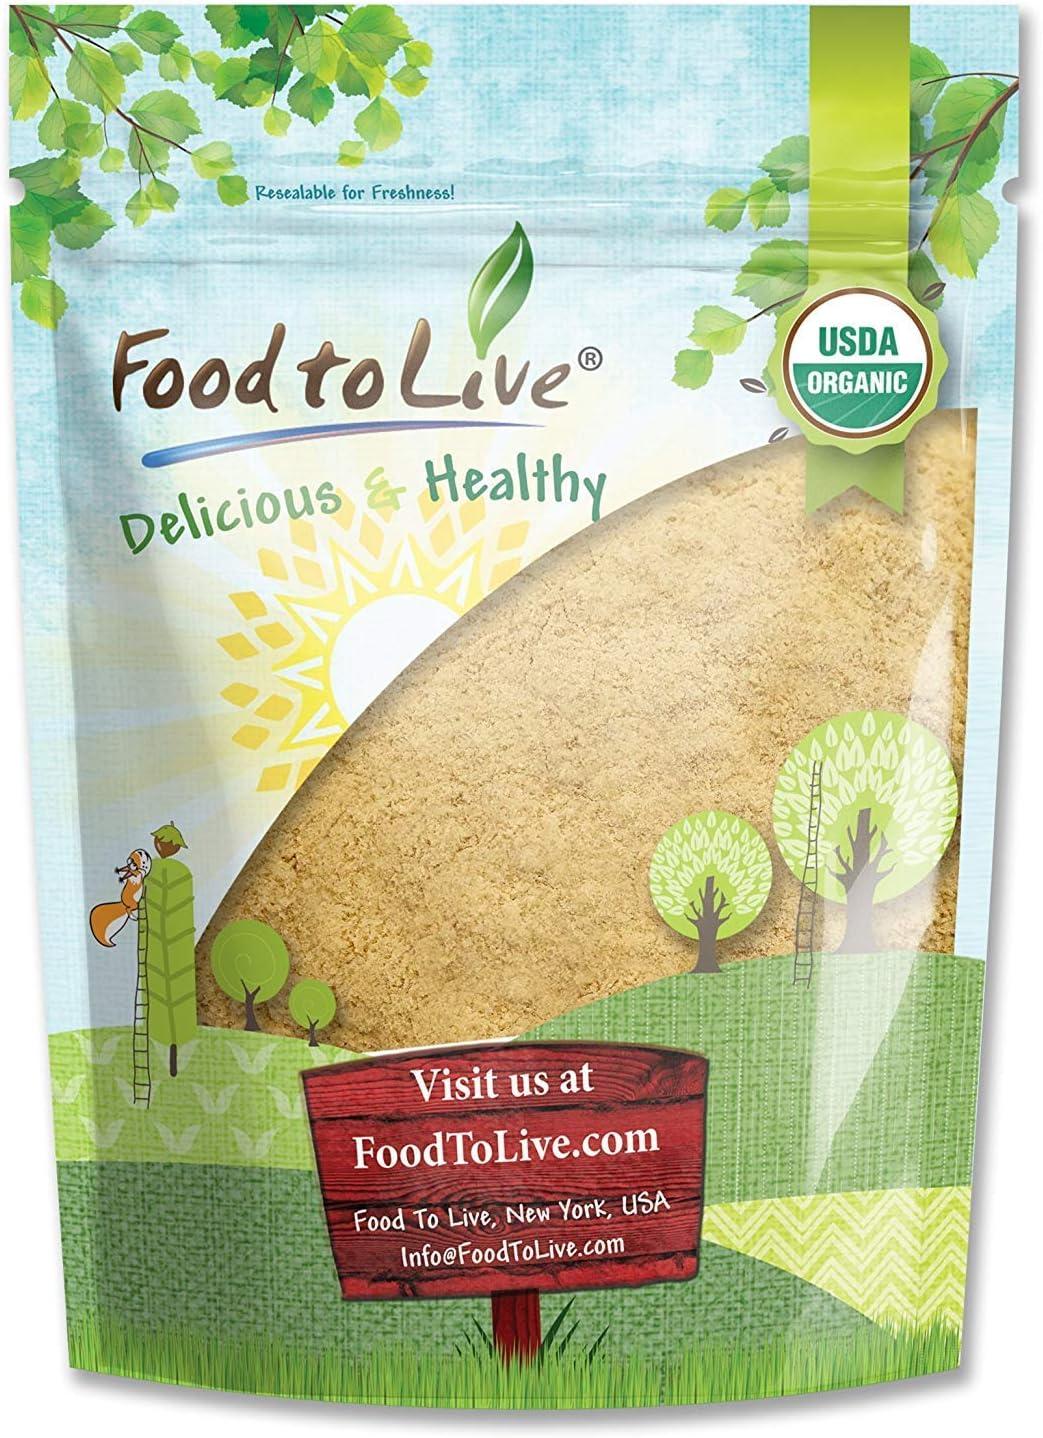 Organic Yellow Maca Powder, 1 Pound - Non-GMO, Kosher, Raw Ground Maca Root, Vegan, Flour, Bulk